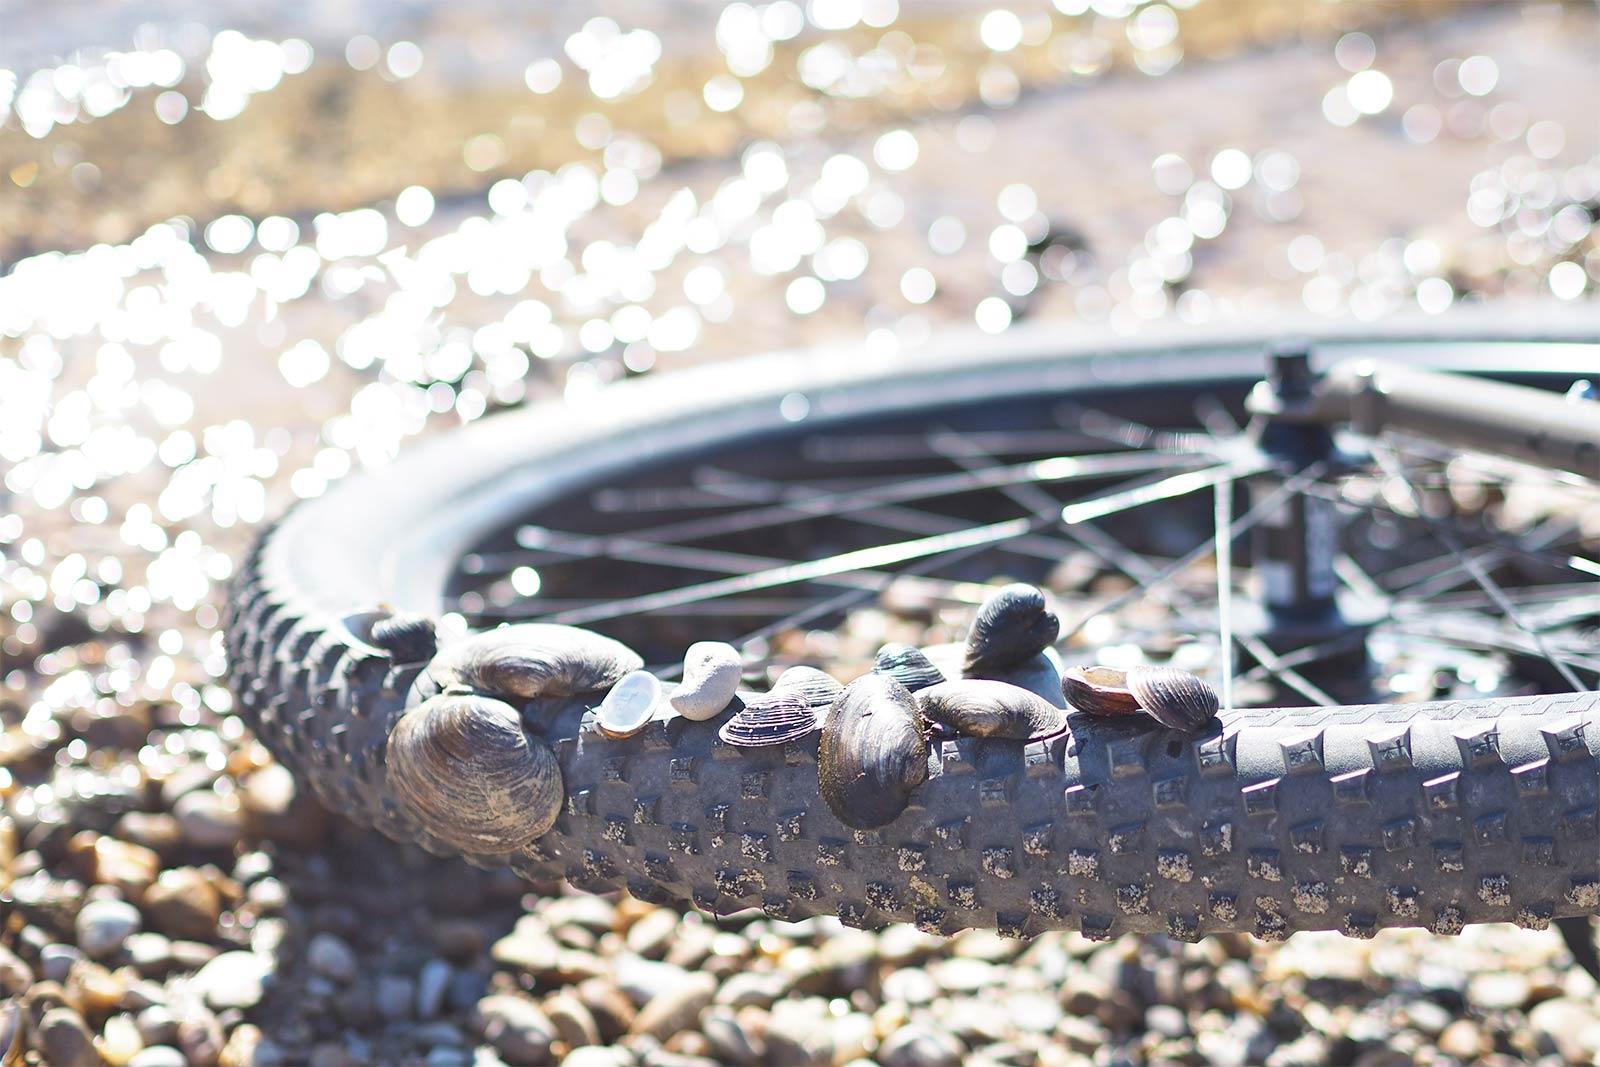 pause-bici-velo-rio-pisuerga-cyl-yoniquenews